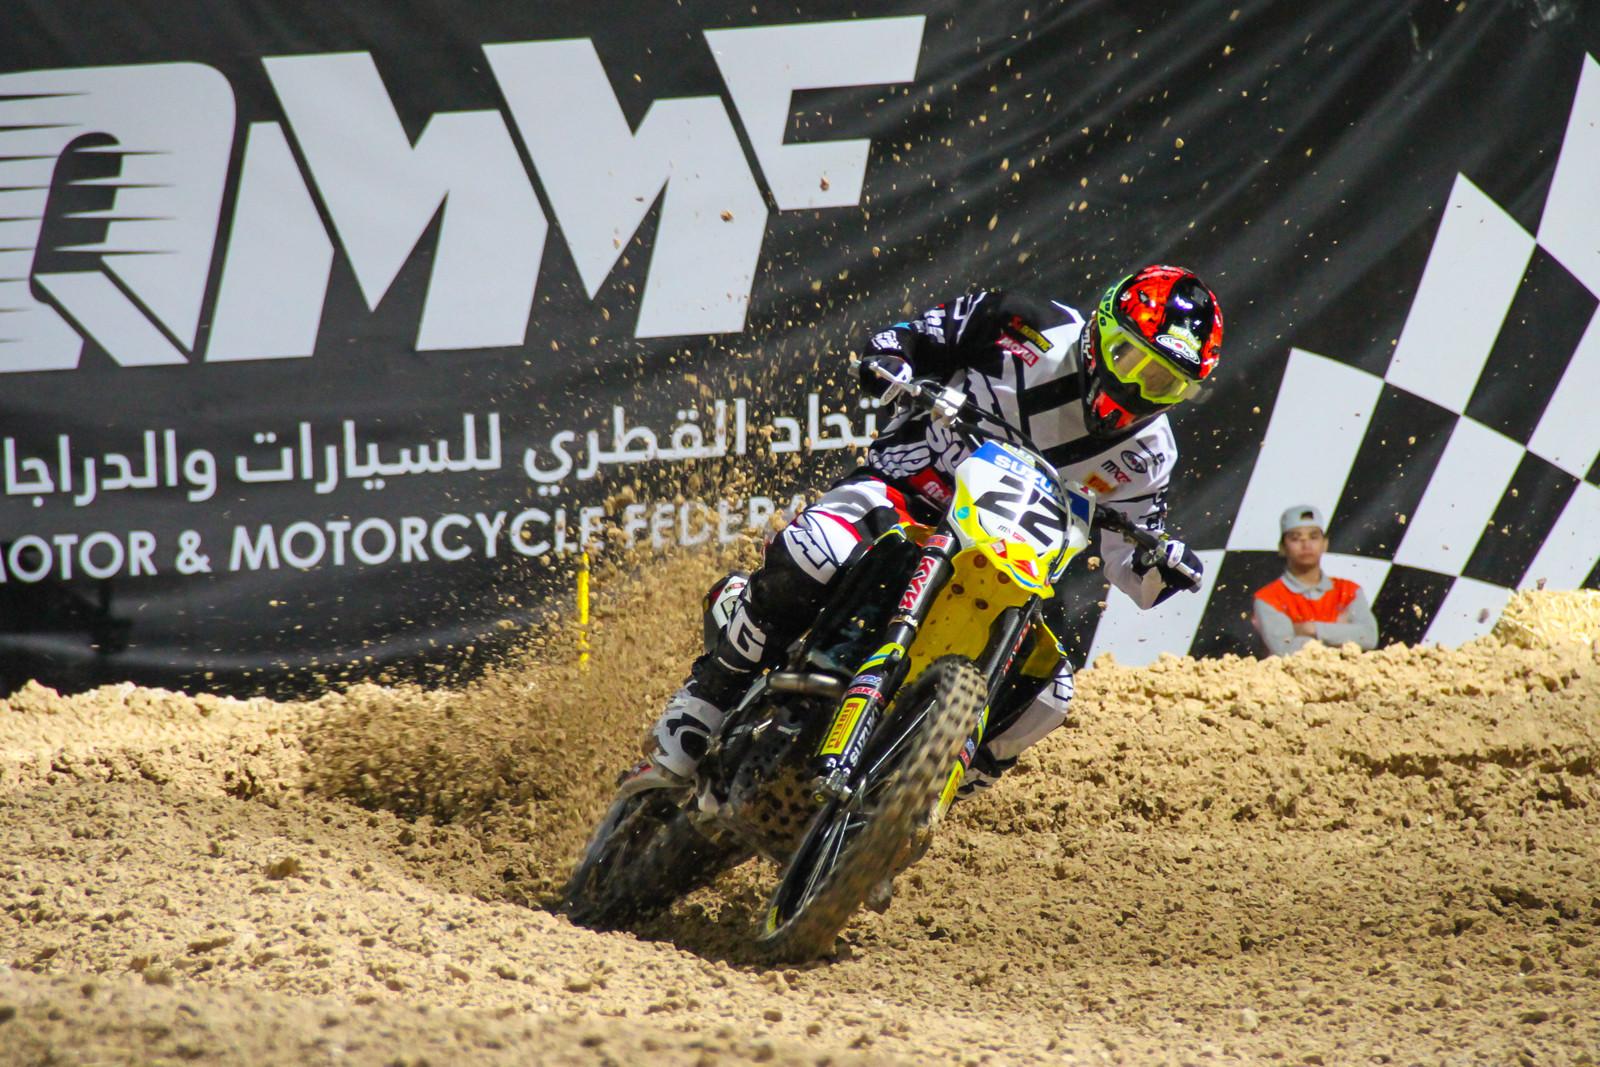 Kevin Strijbos - Photo Blast: 2017 MXGP of Qatar - Motocross Pictures - Vital MX